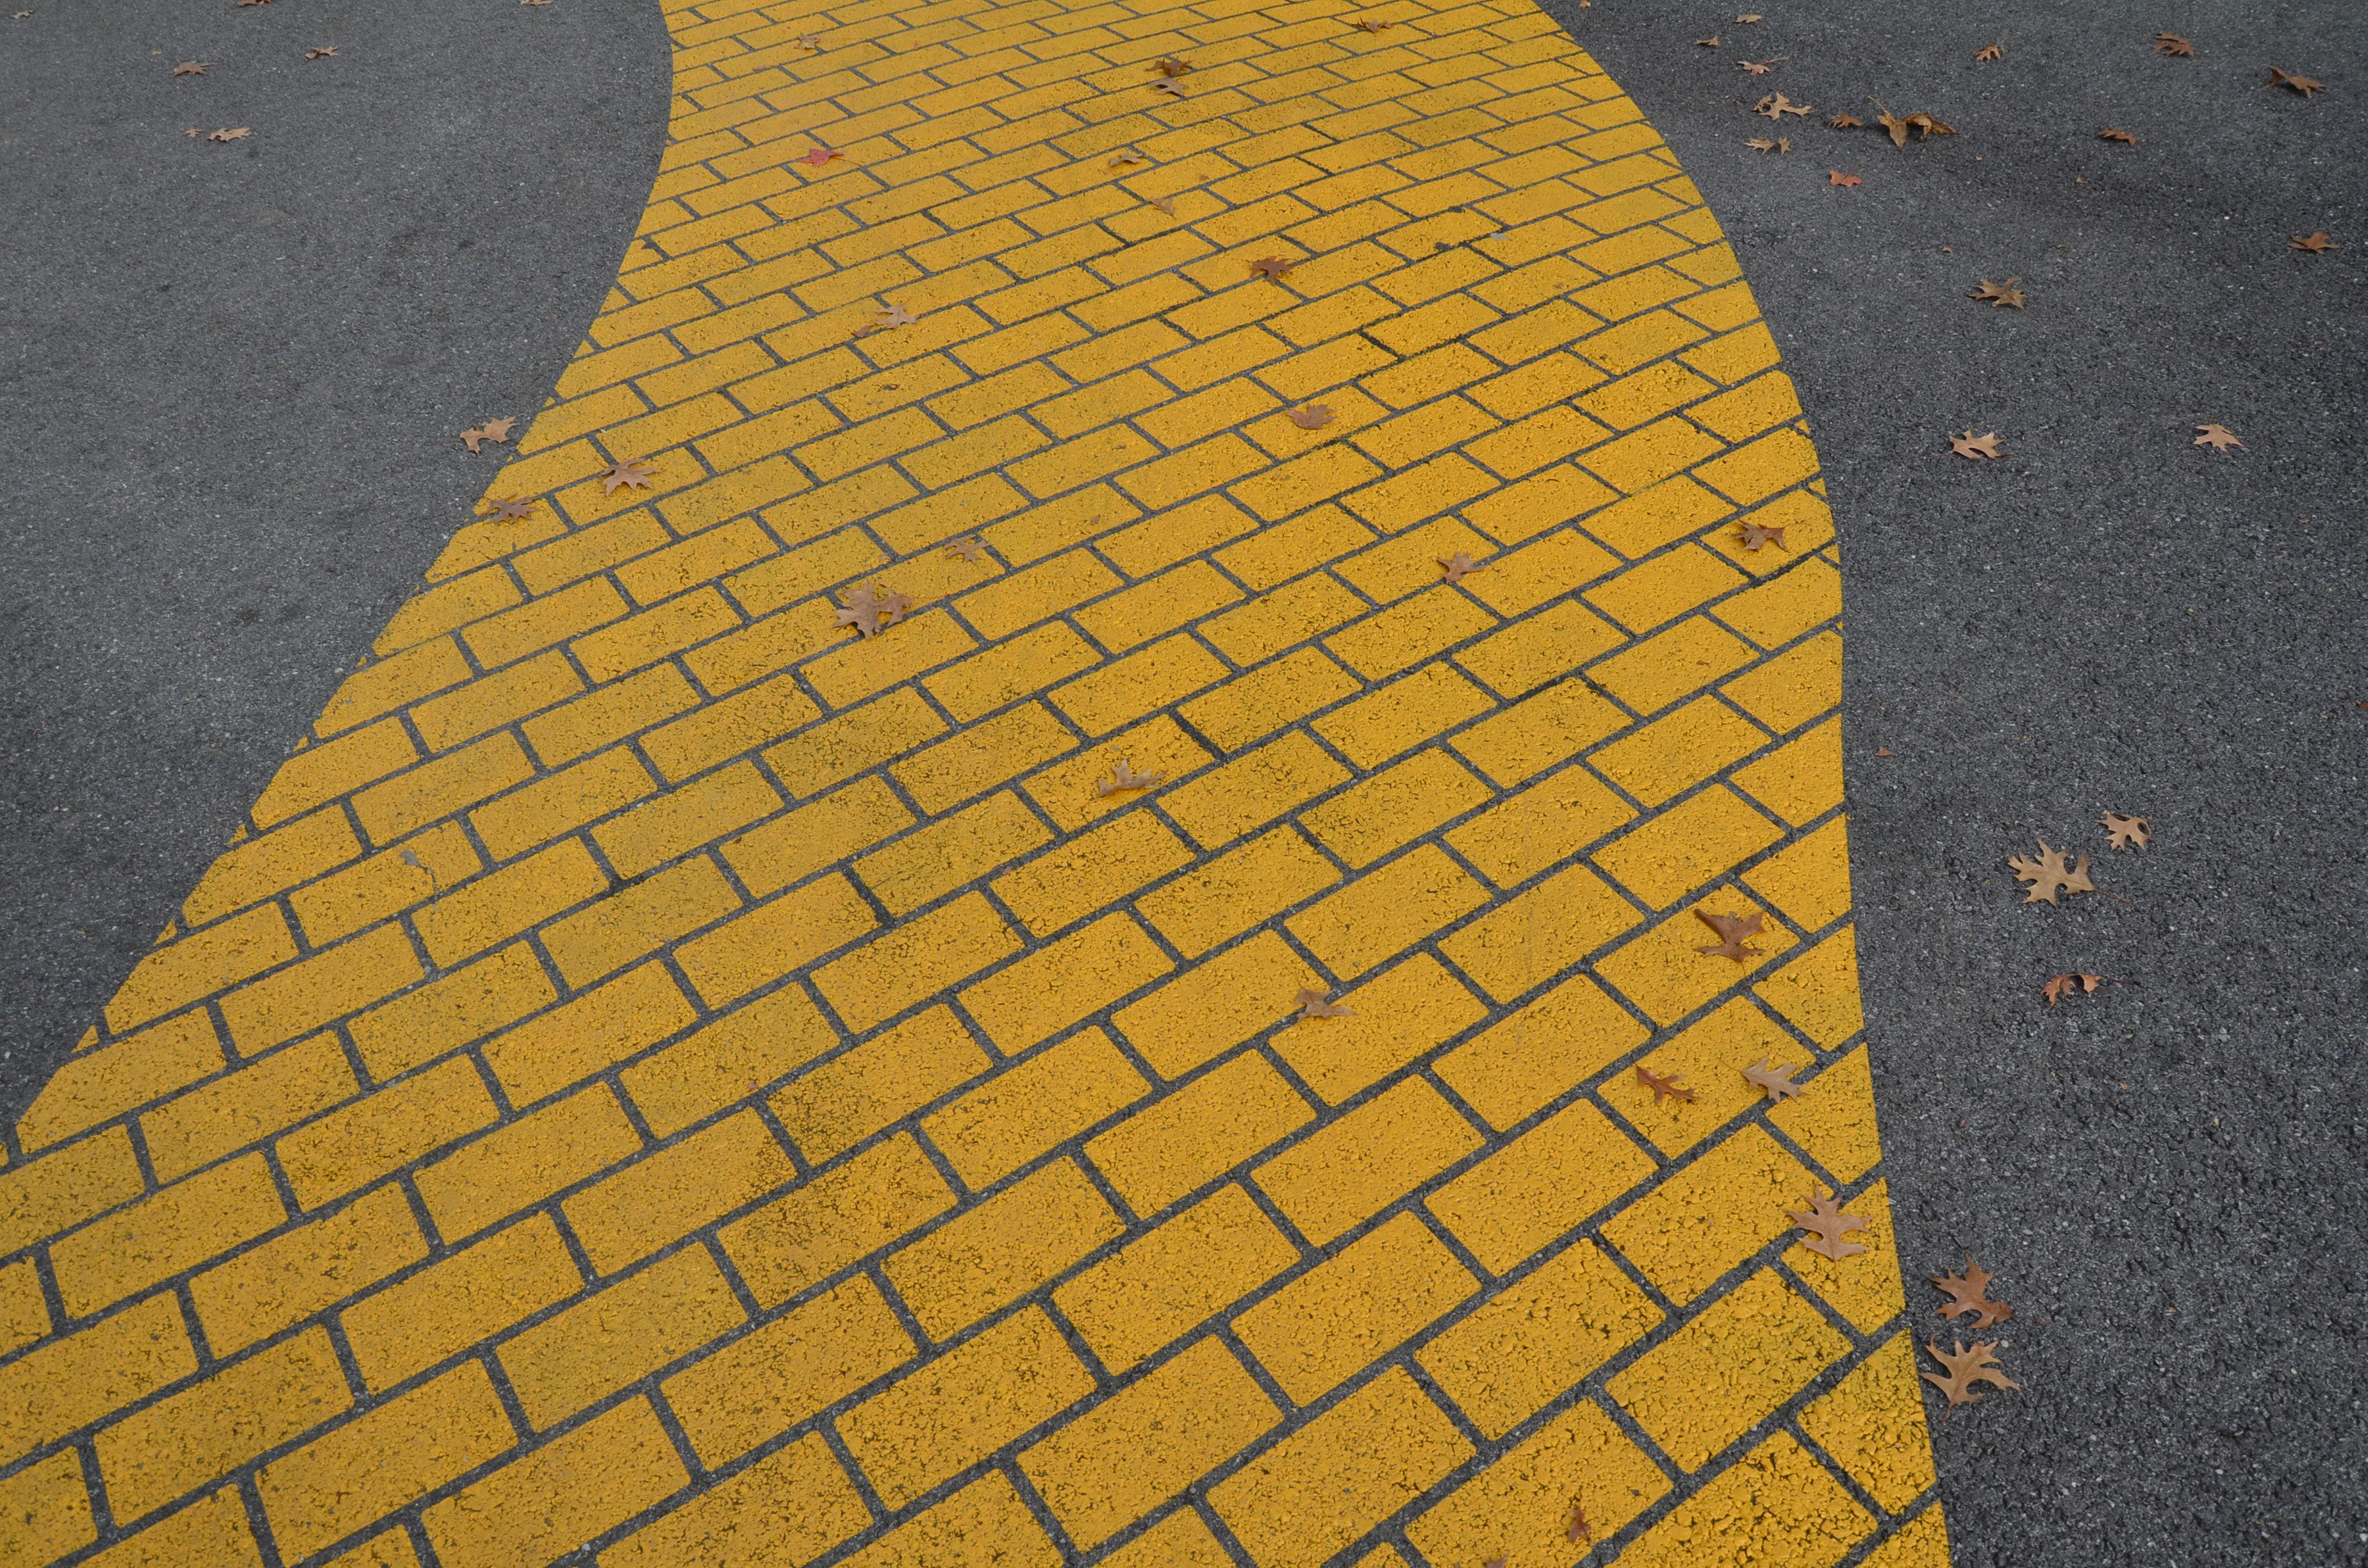 Yellow lane roadway